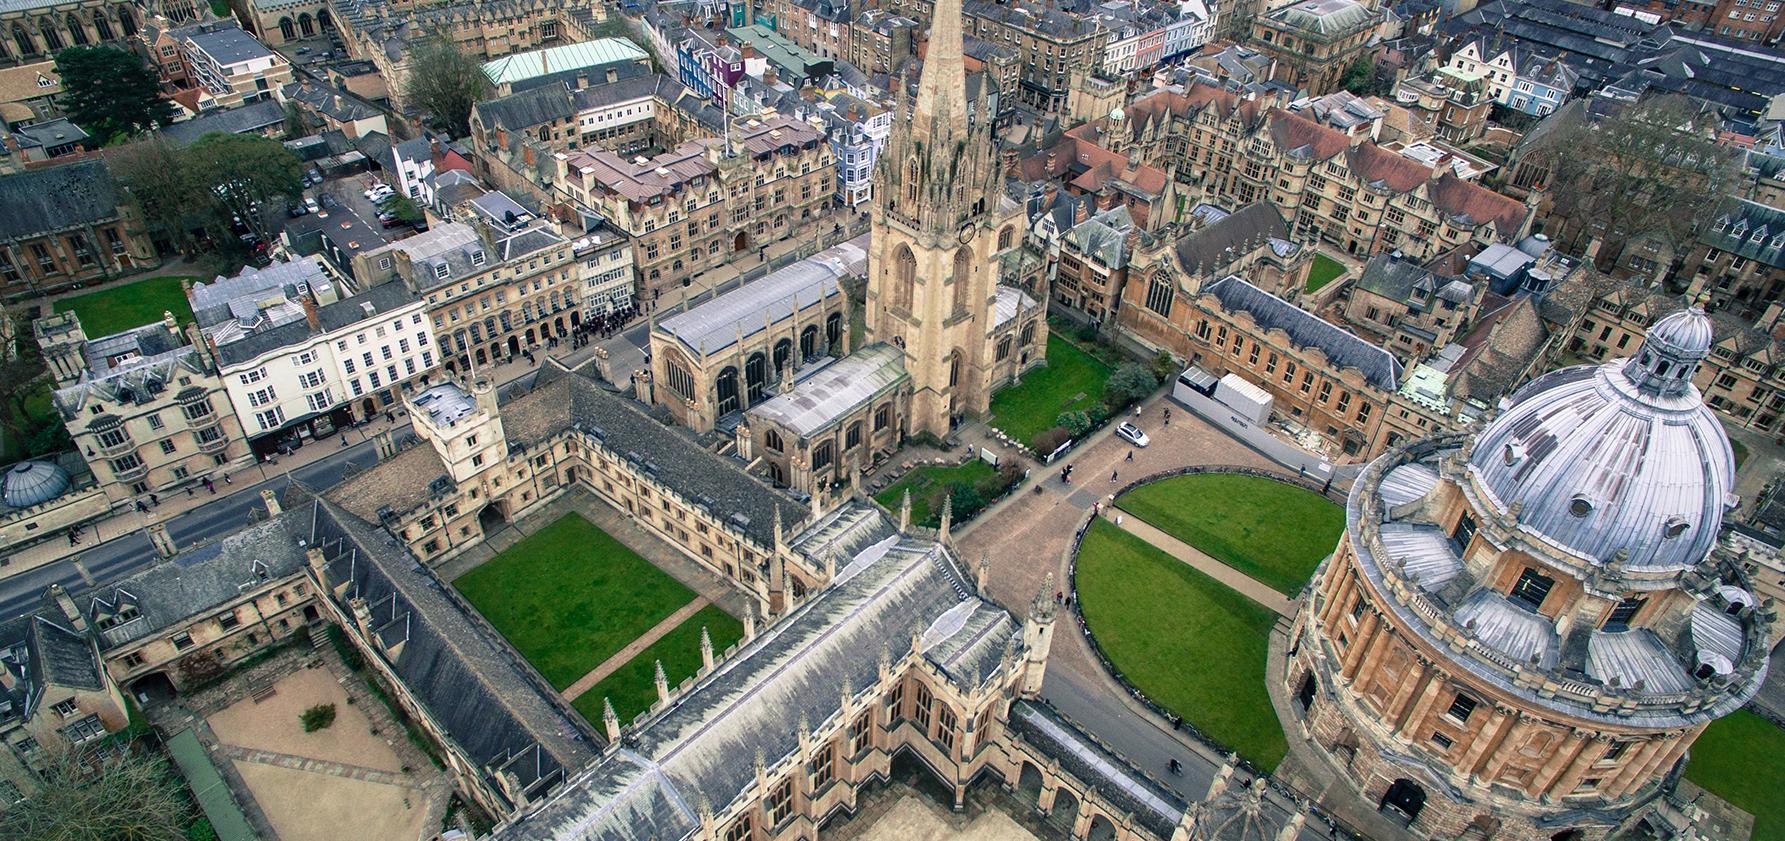 Oxford University campus